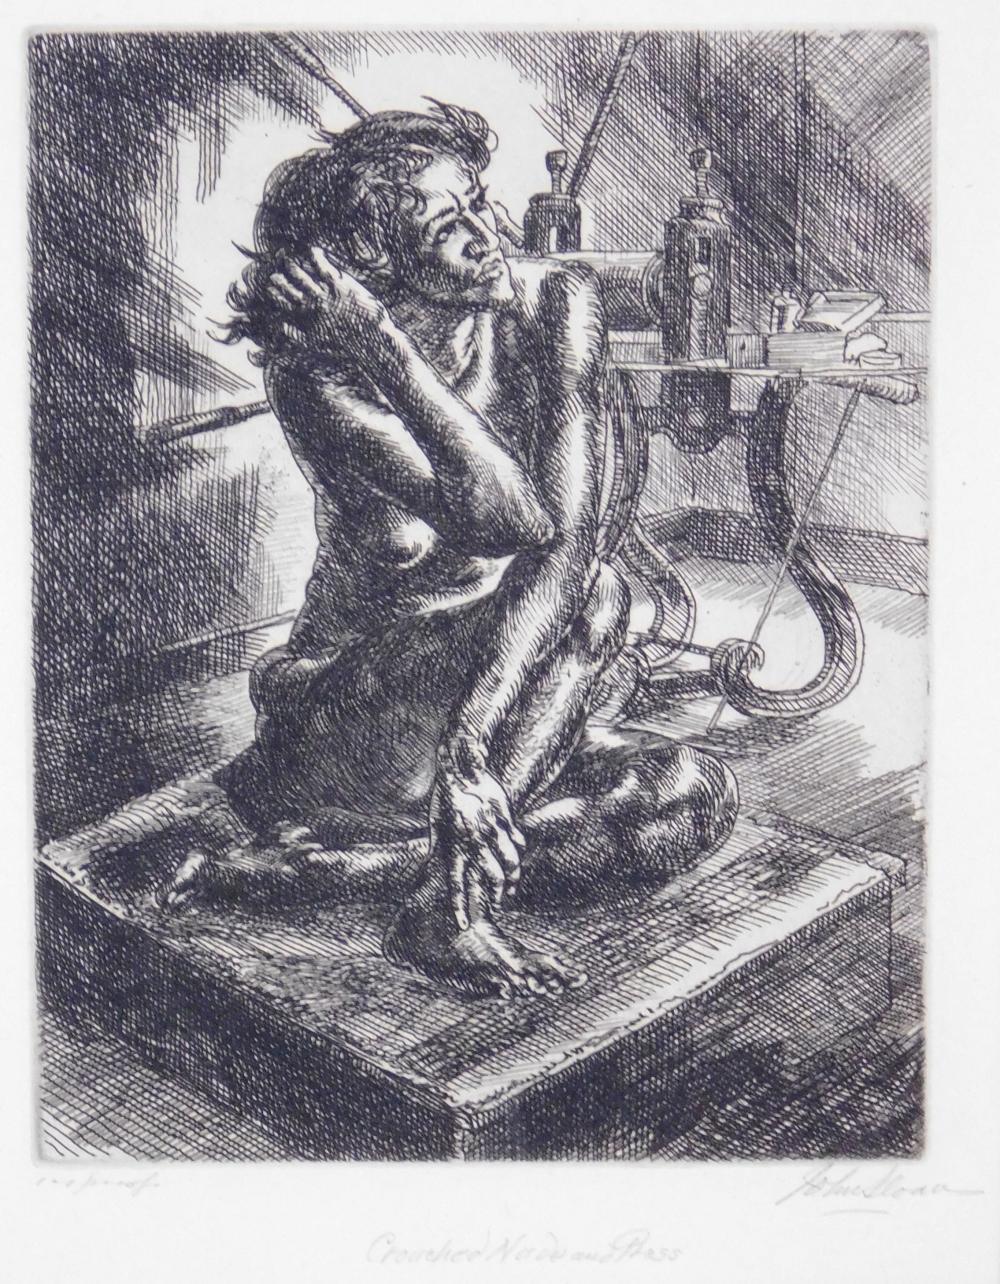 Lot - John Sloan (American, 1871-1951), Crouching Nude